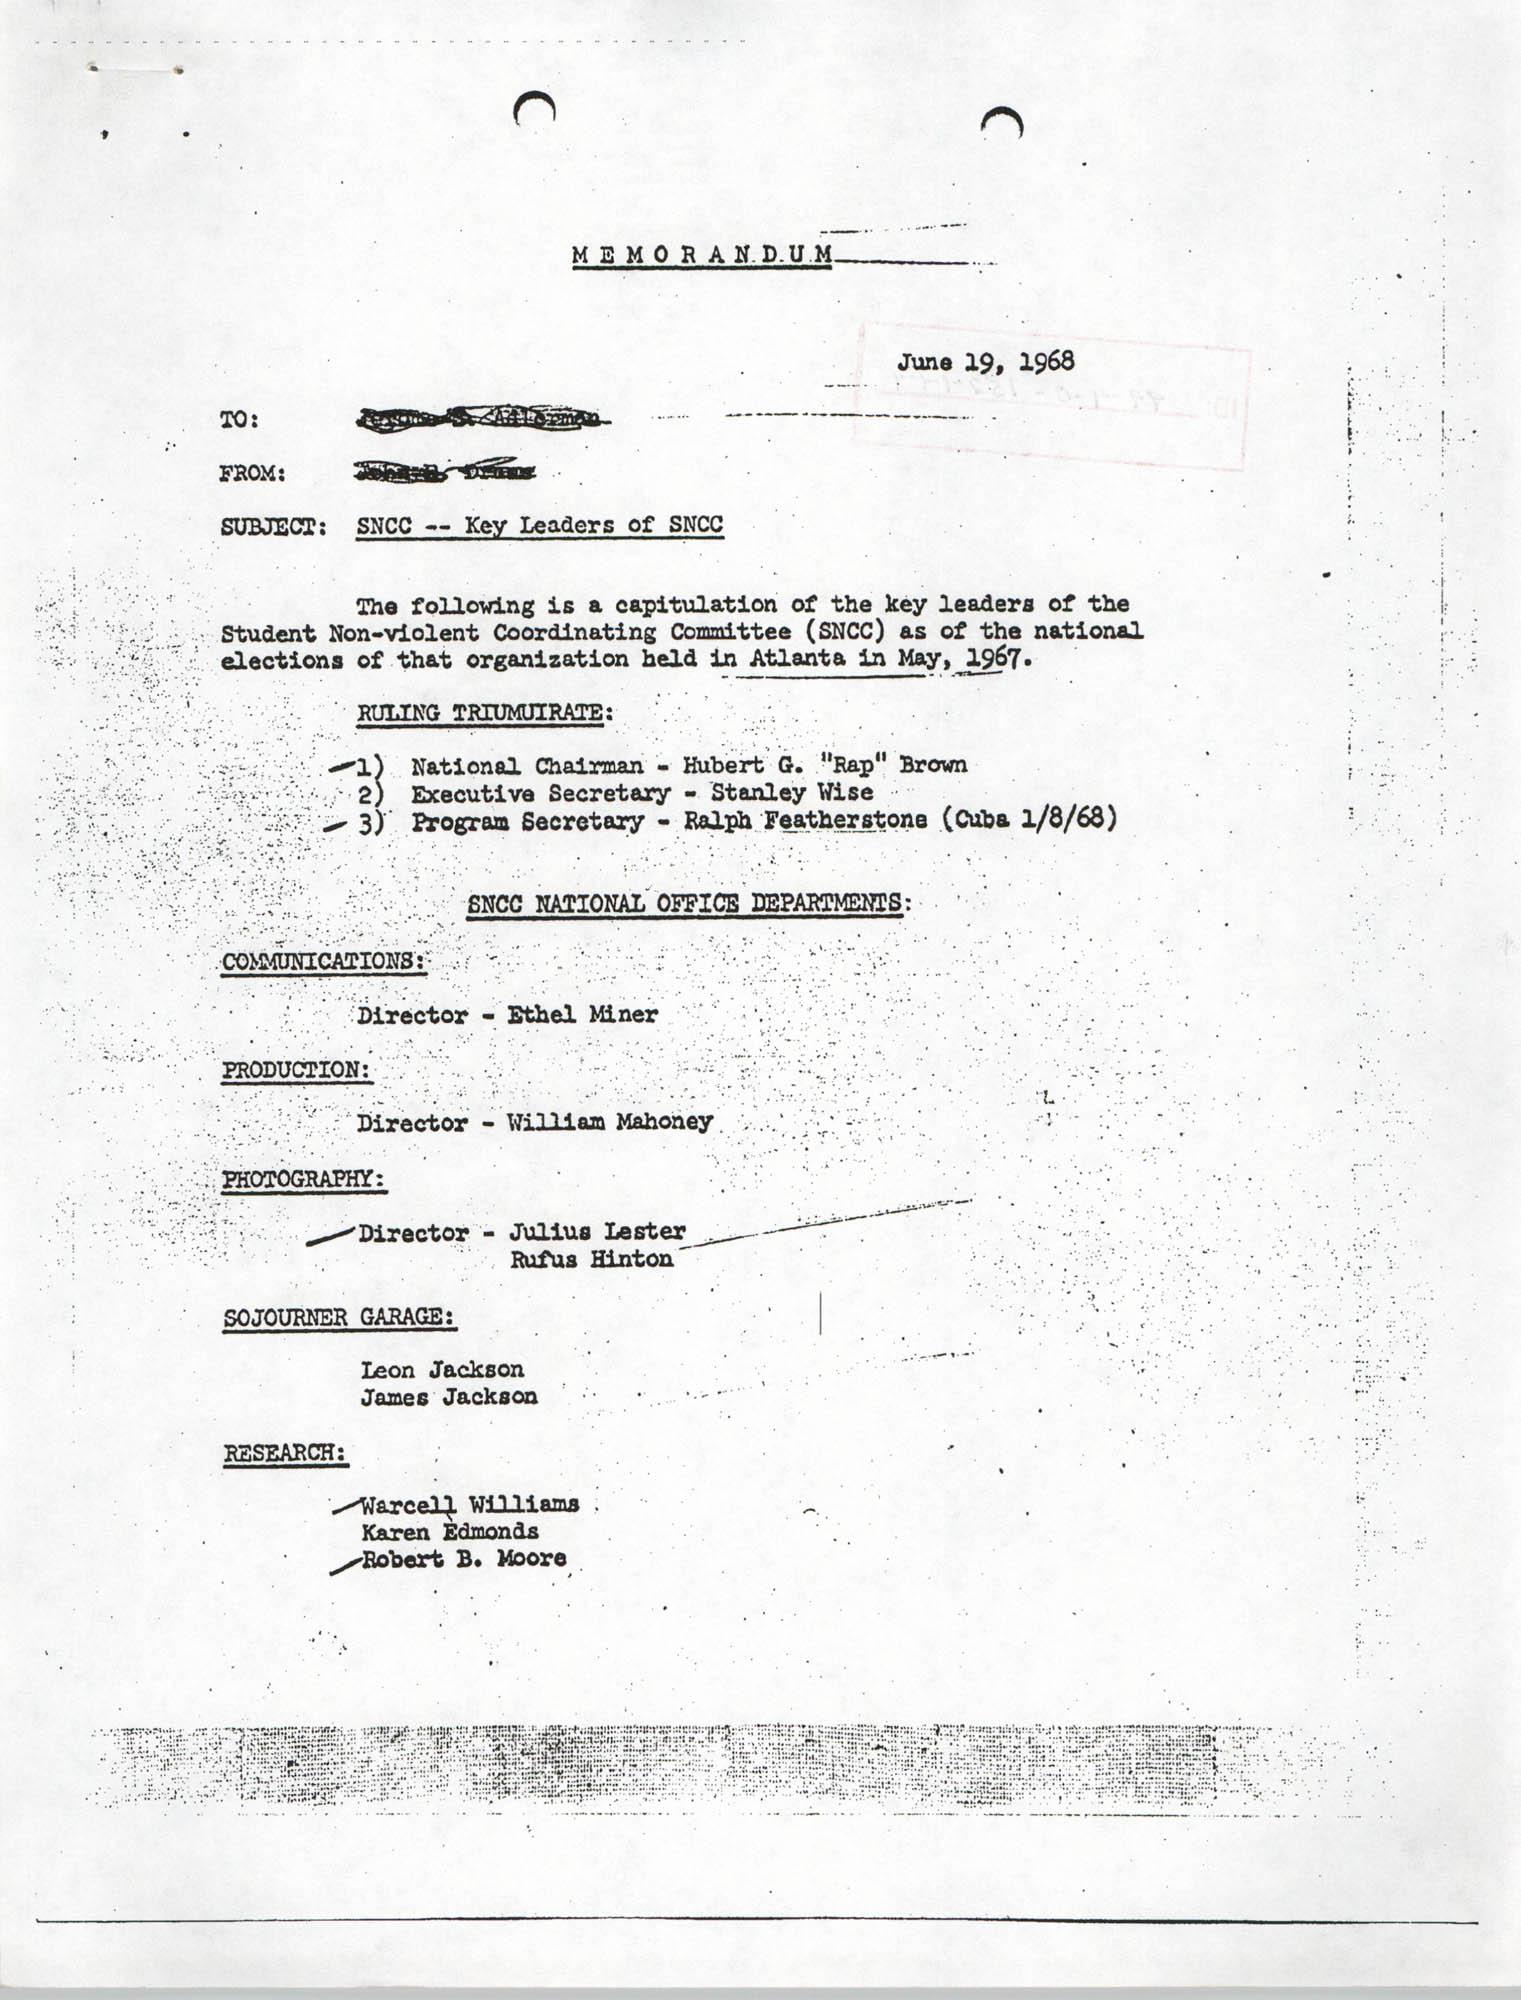 Memorandum Regarding Key Leaders of SNCC, Page 1